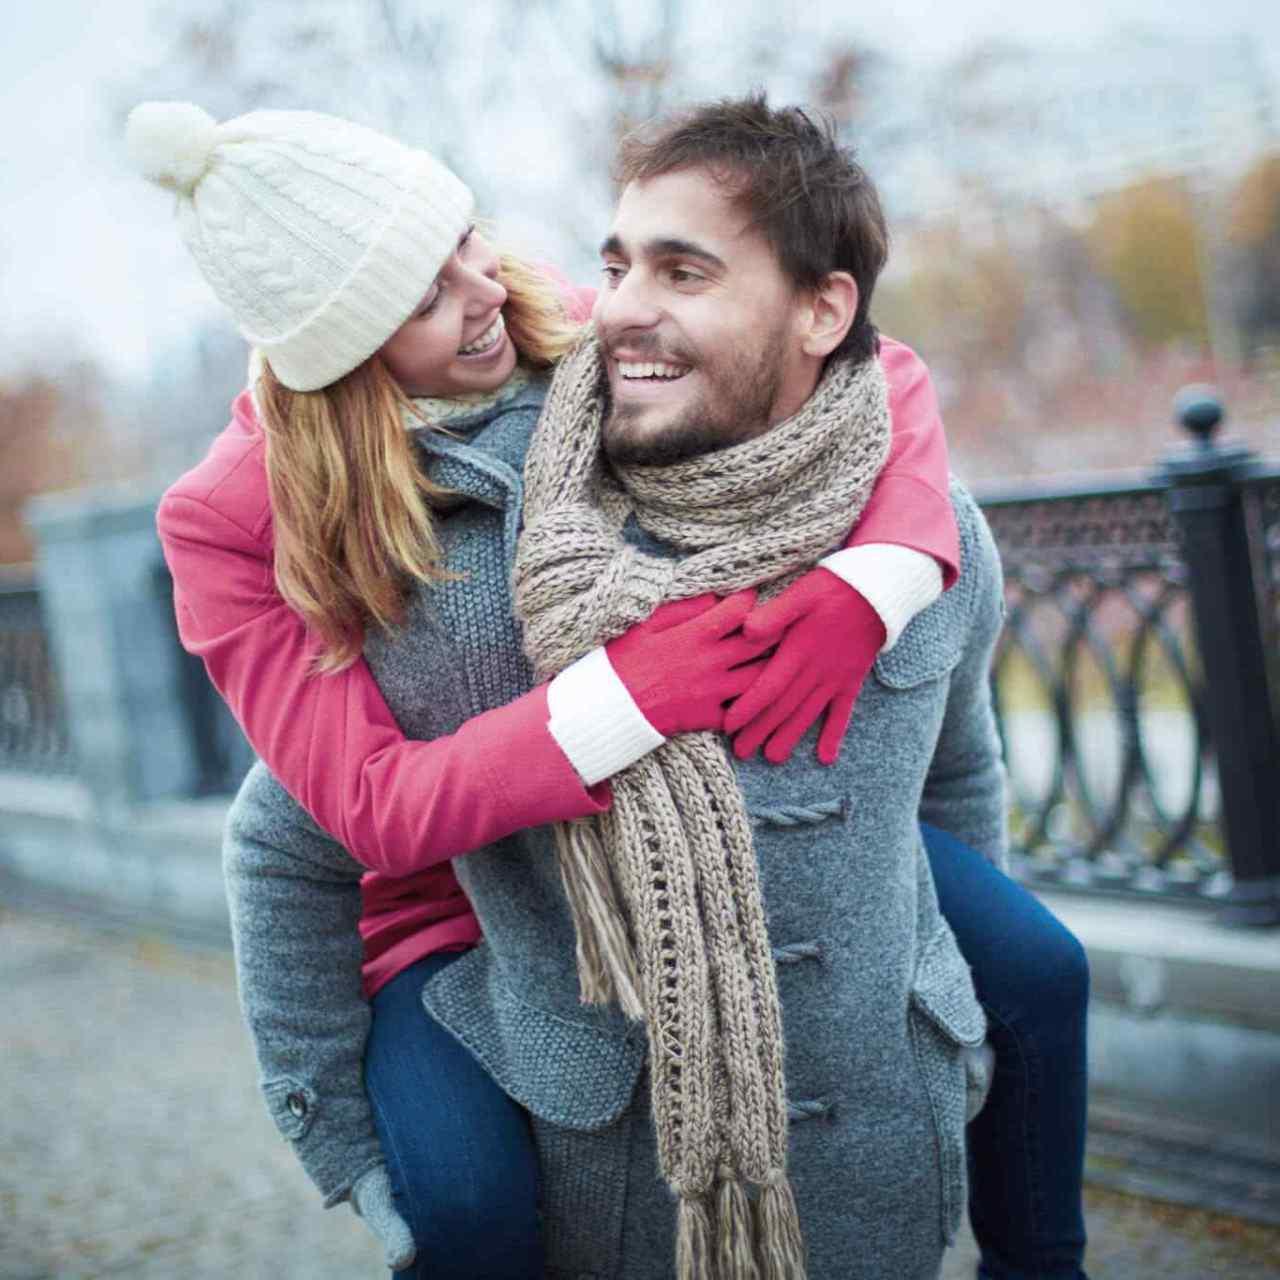 https://i2.wp.com/truhap.com/wp-content/uploads/2018/01/img-event-marriage-01.jpg?resize=1280%2C1280&ssl=1